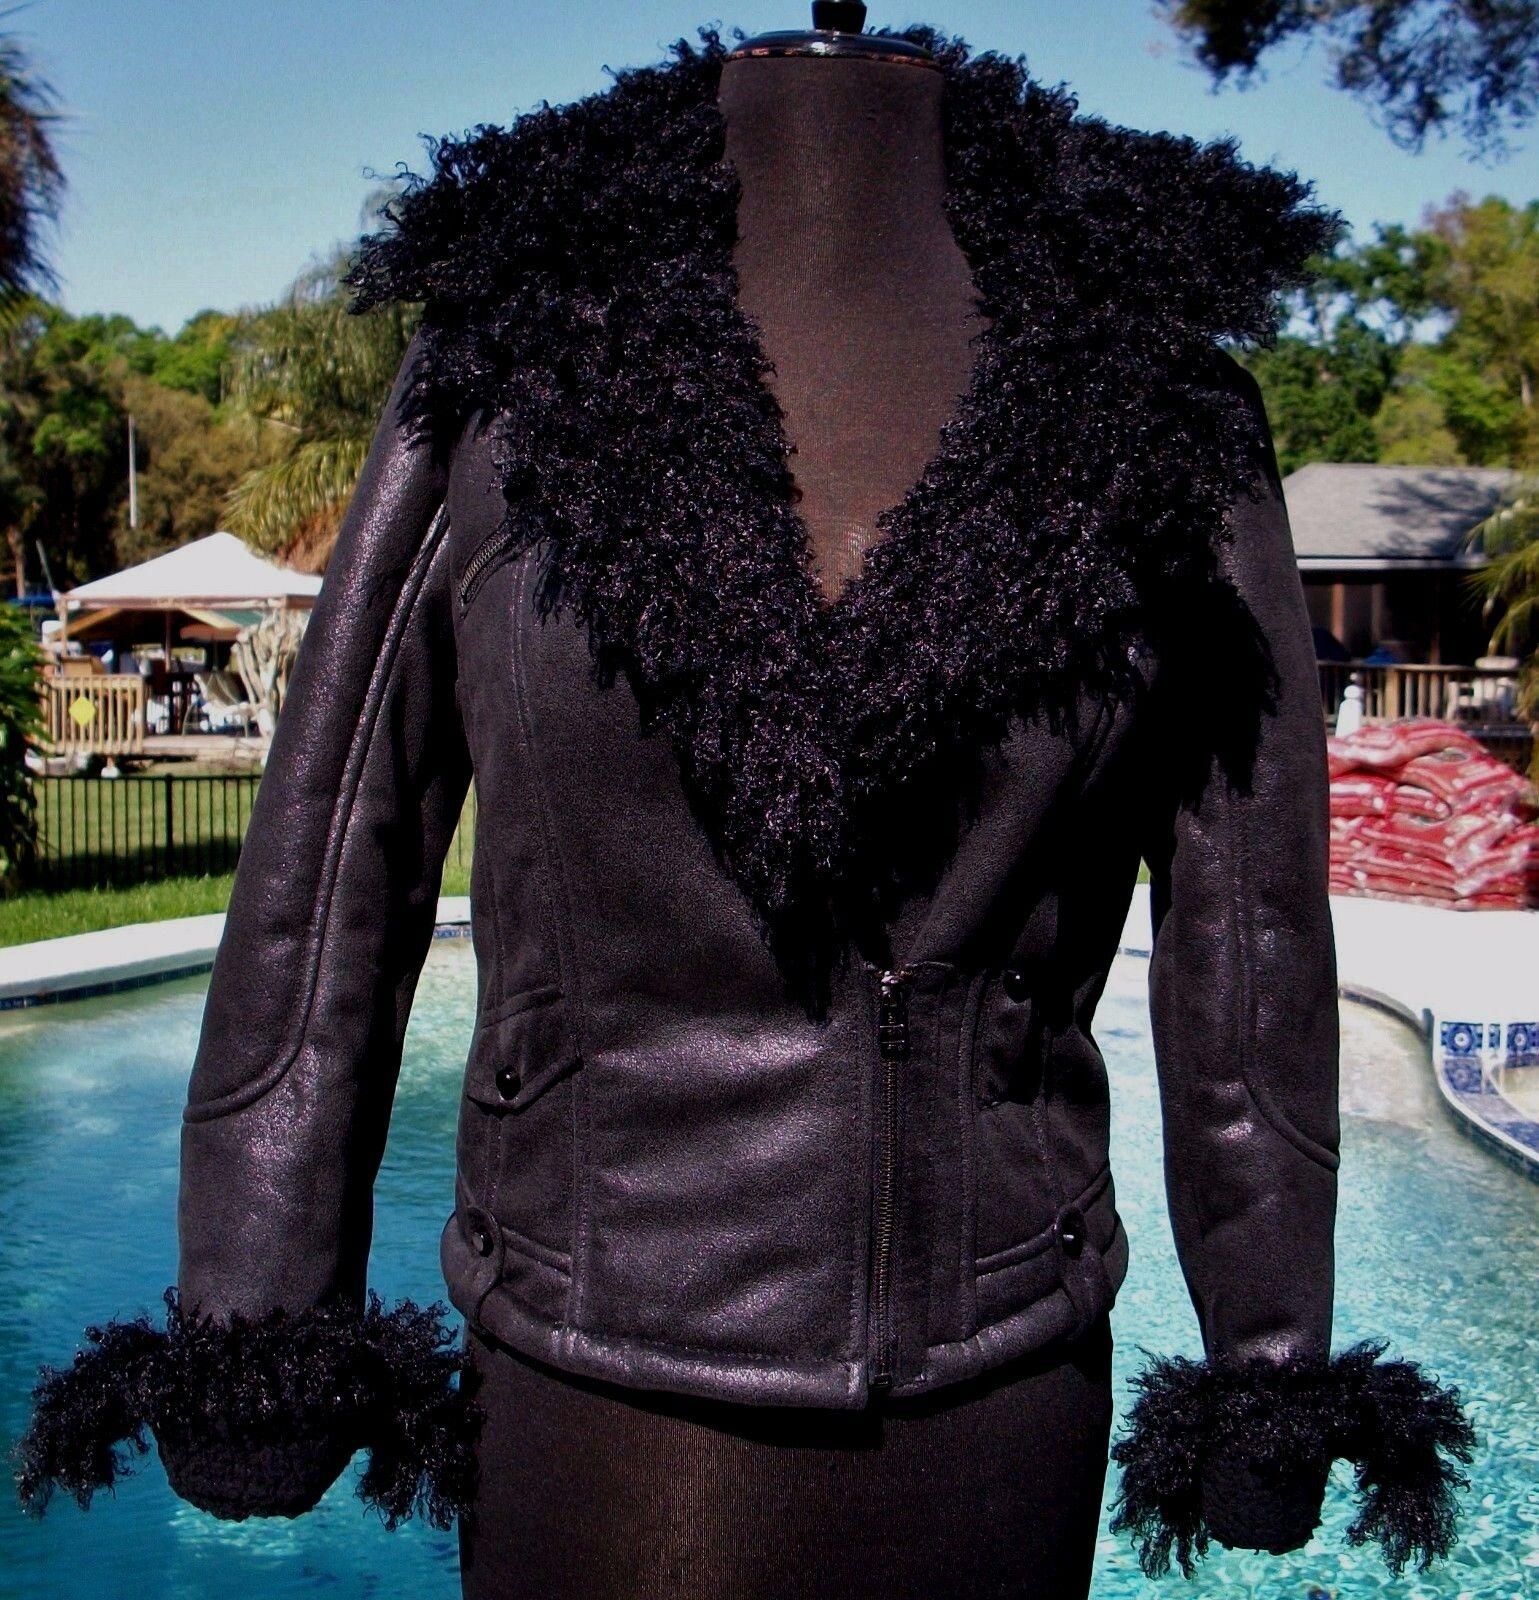 Donald Pliner Couture Gator Hair New Calf  Leder schuhe New Hair T Strap Platform $325 NIB e85348